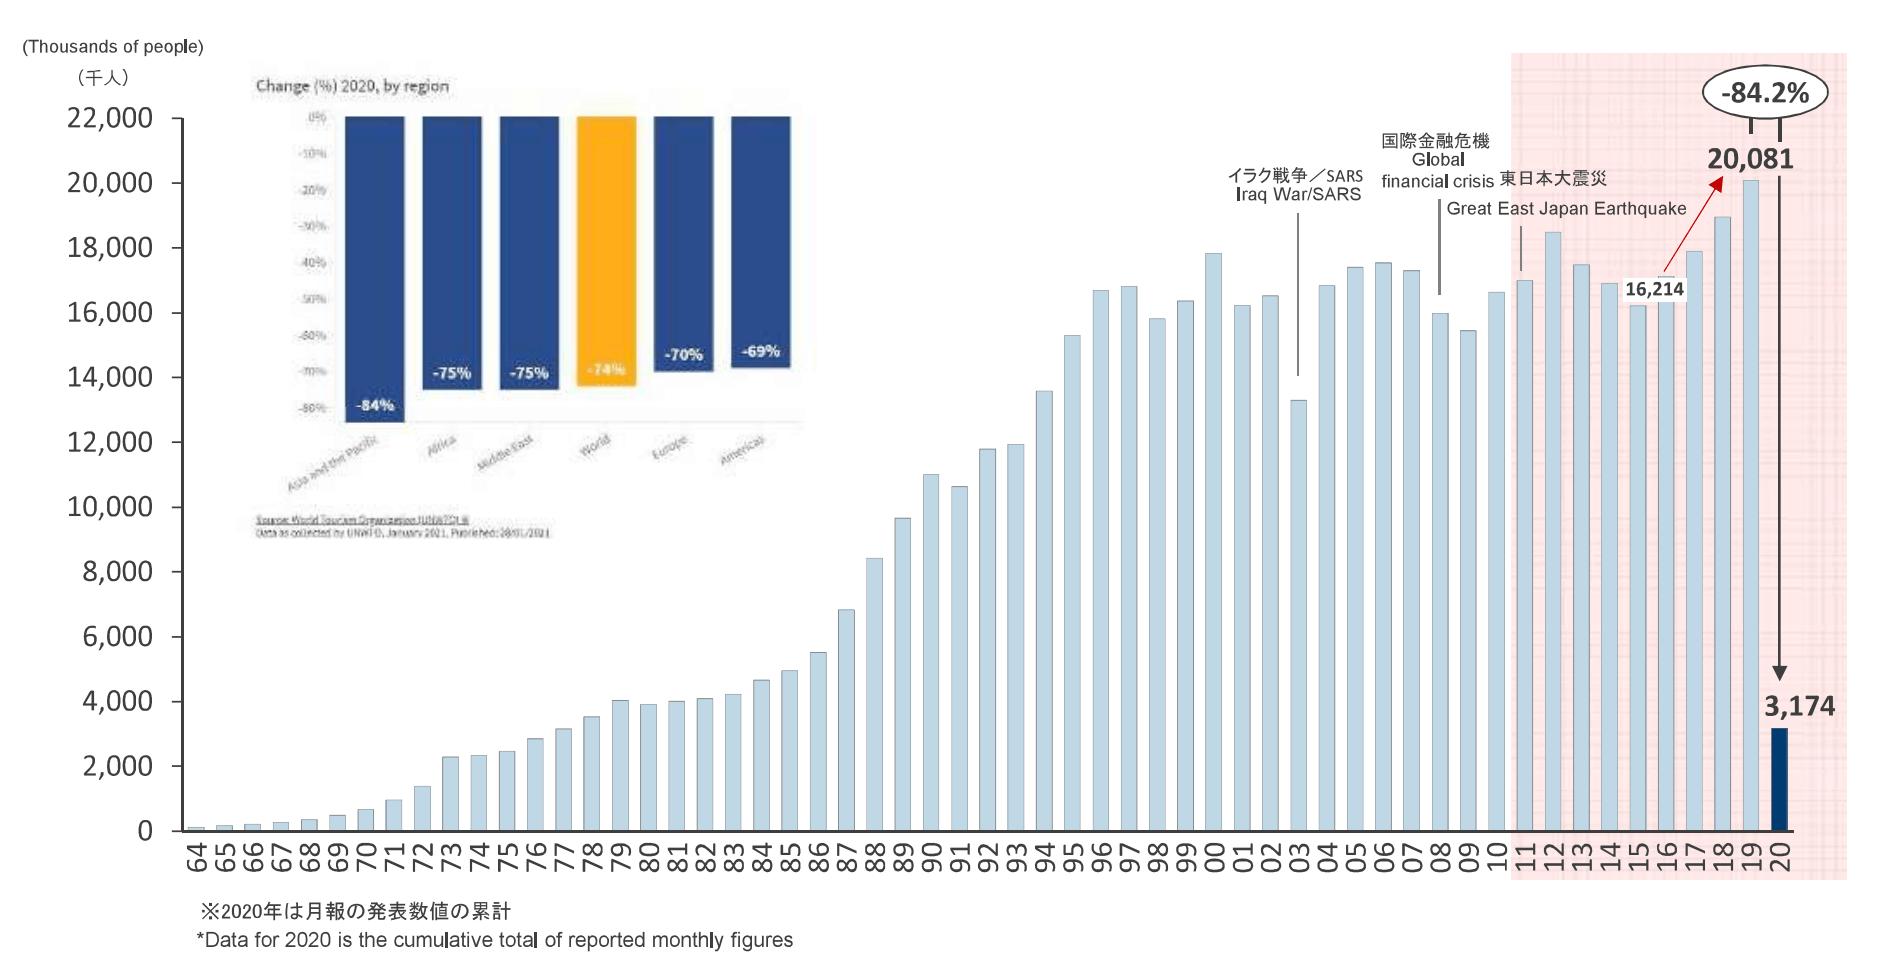 Survey of Future Overseas Travel Sentiment Among Japanese Amid the Coronavirus Pandemic – Feb2021